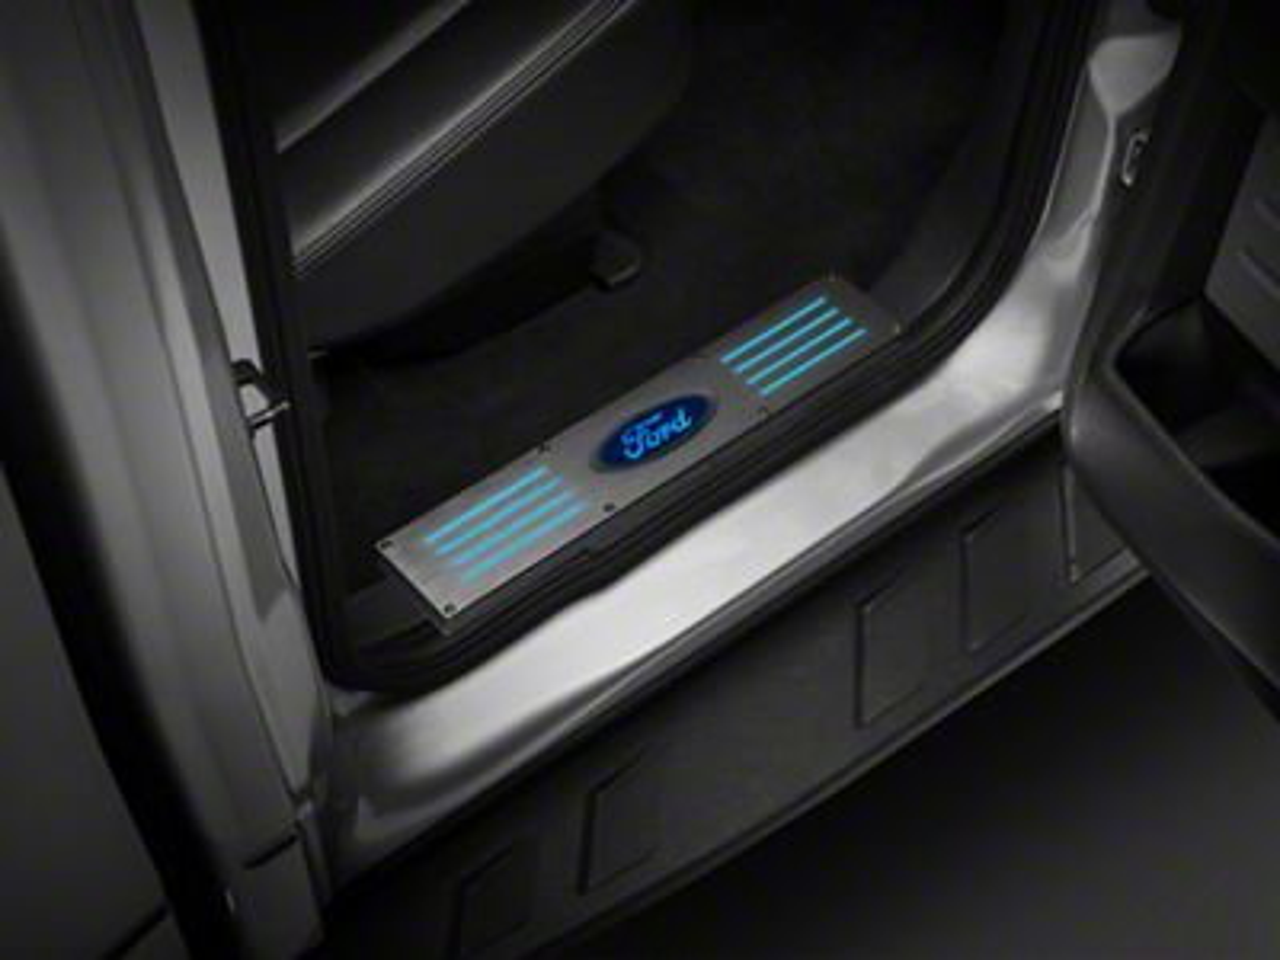 Billet Door Sill - Brushed Finish w/ Blue Illumination (09-14 F-150 SuperCrew)